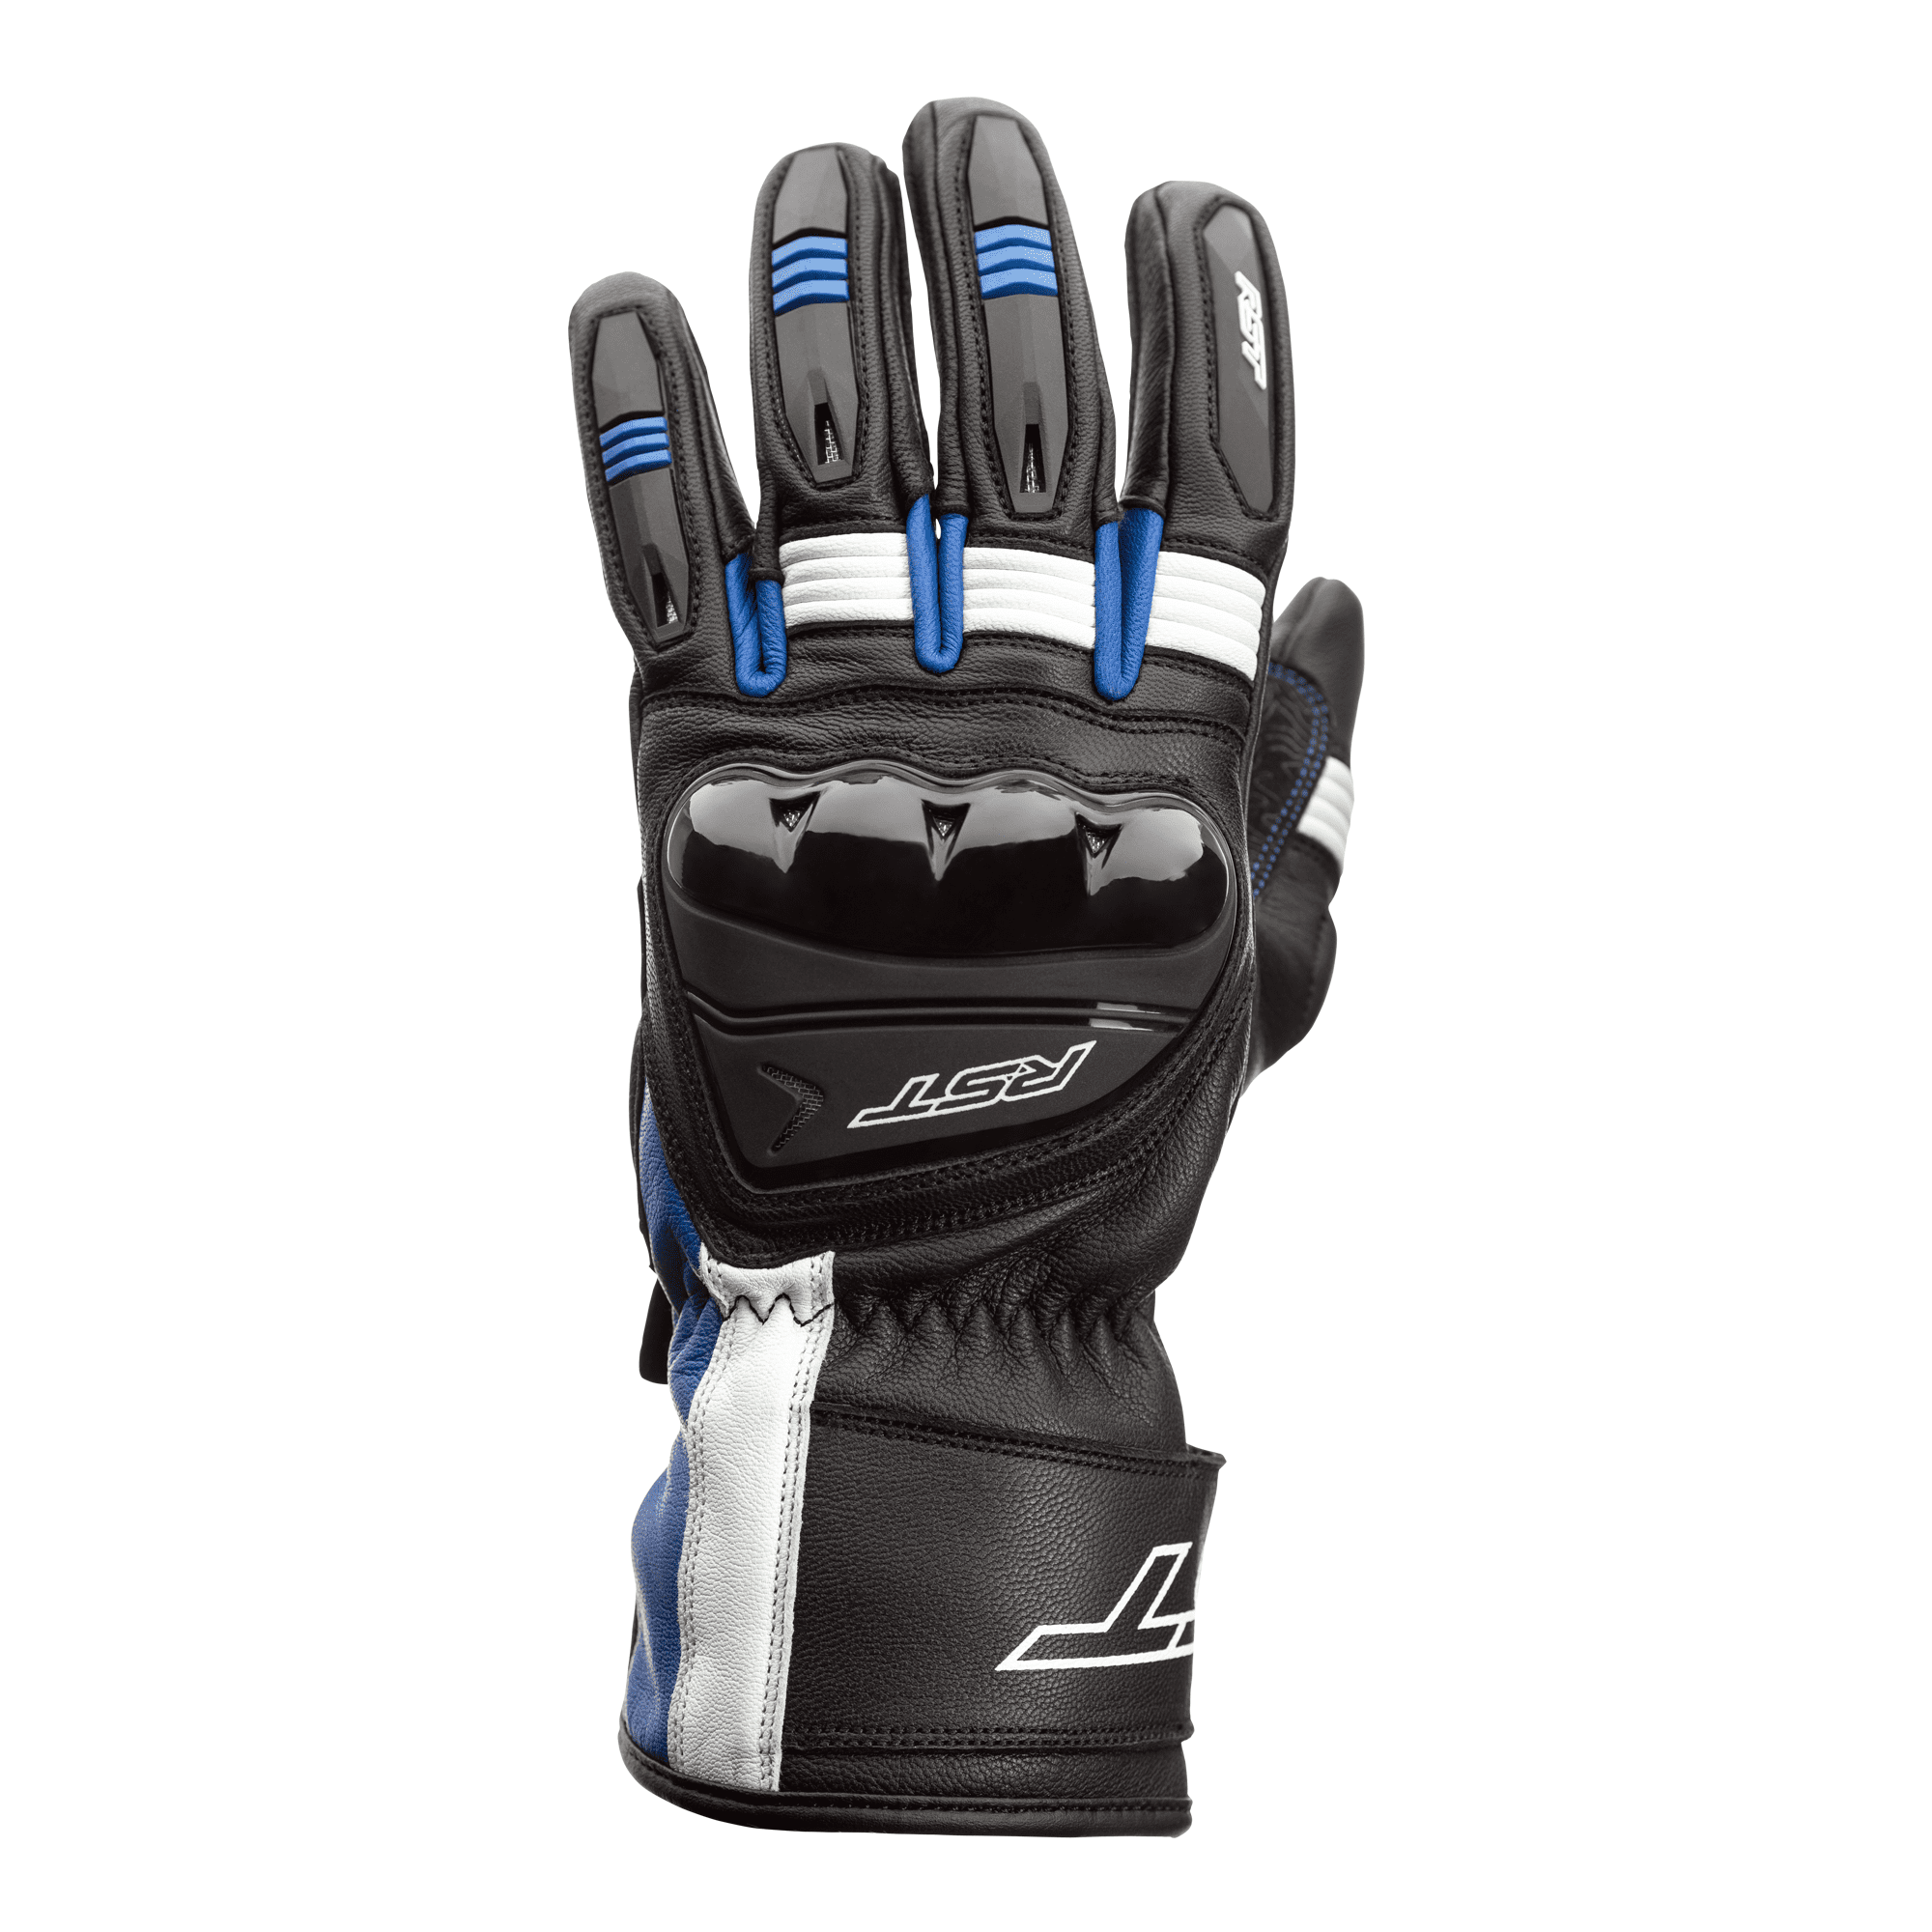 RST Pilot CE Blue Leather Amara Motorcycle Glove Size 09